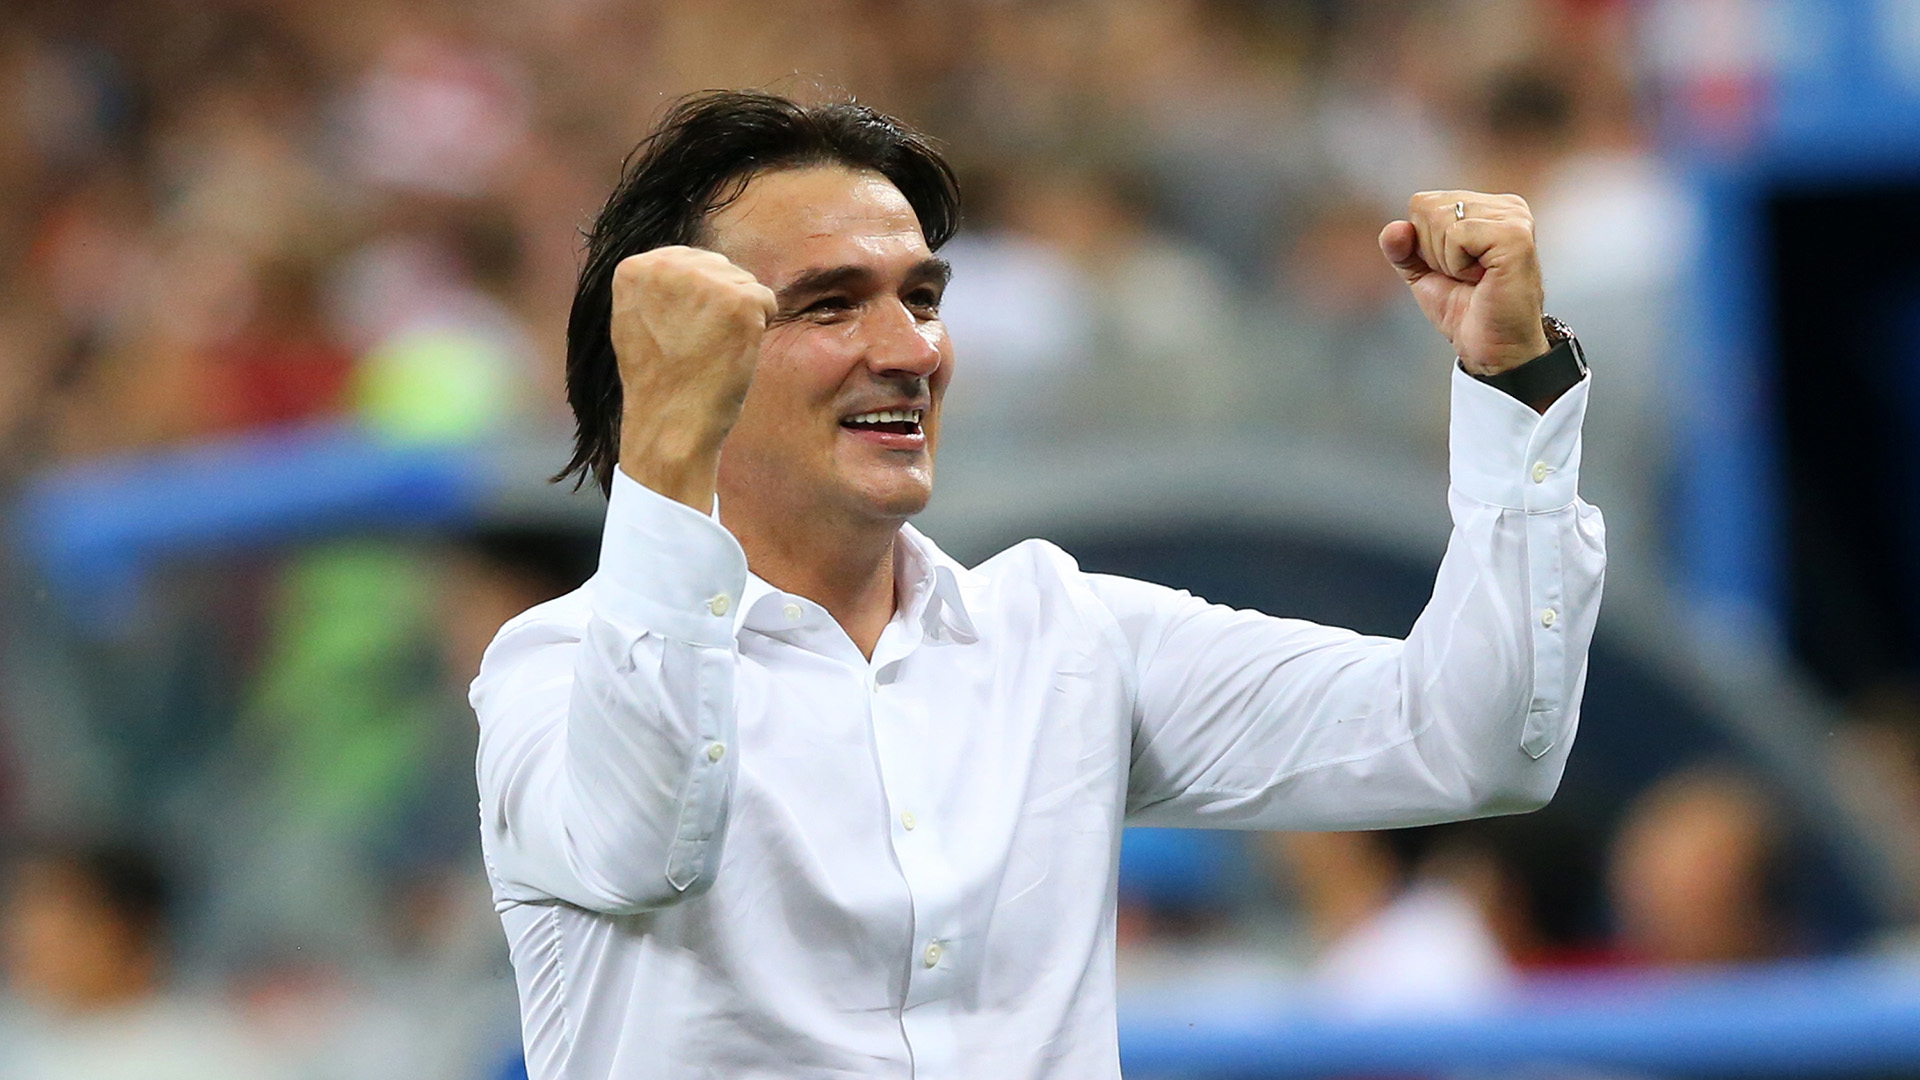 http://hrvatskifokus-2021.ga/wp-content/uploads/2018/07/zlatko-dalic-croatia-world-cup-2018_32u24c858rwp1hjjdic6h58no.jpg